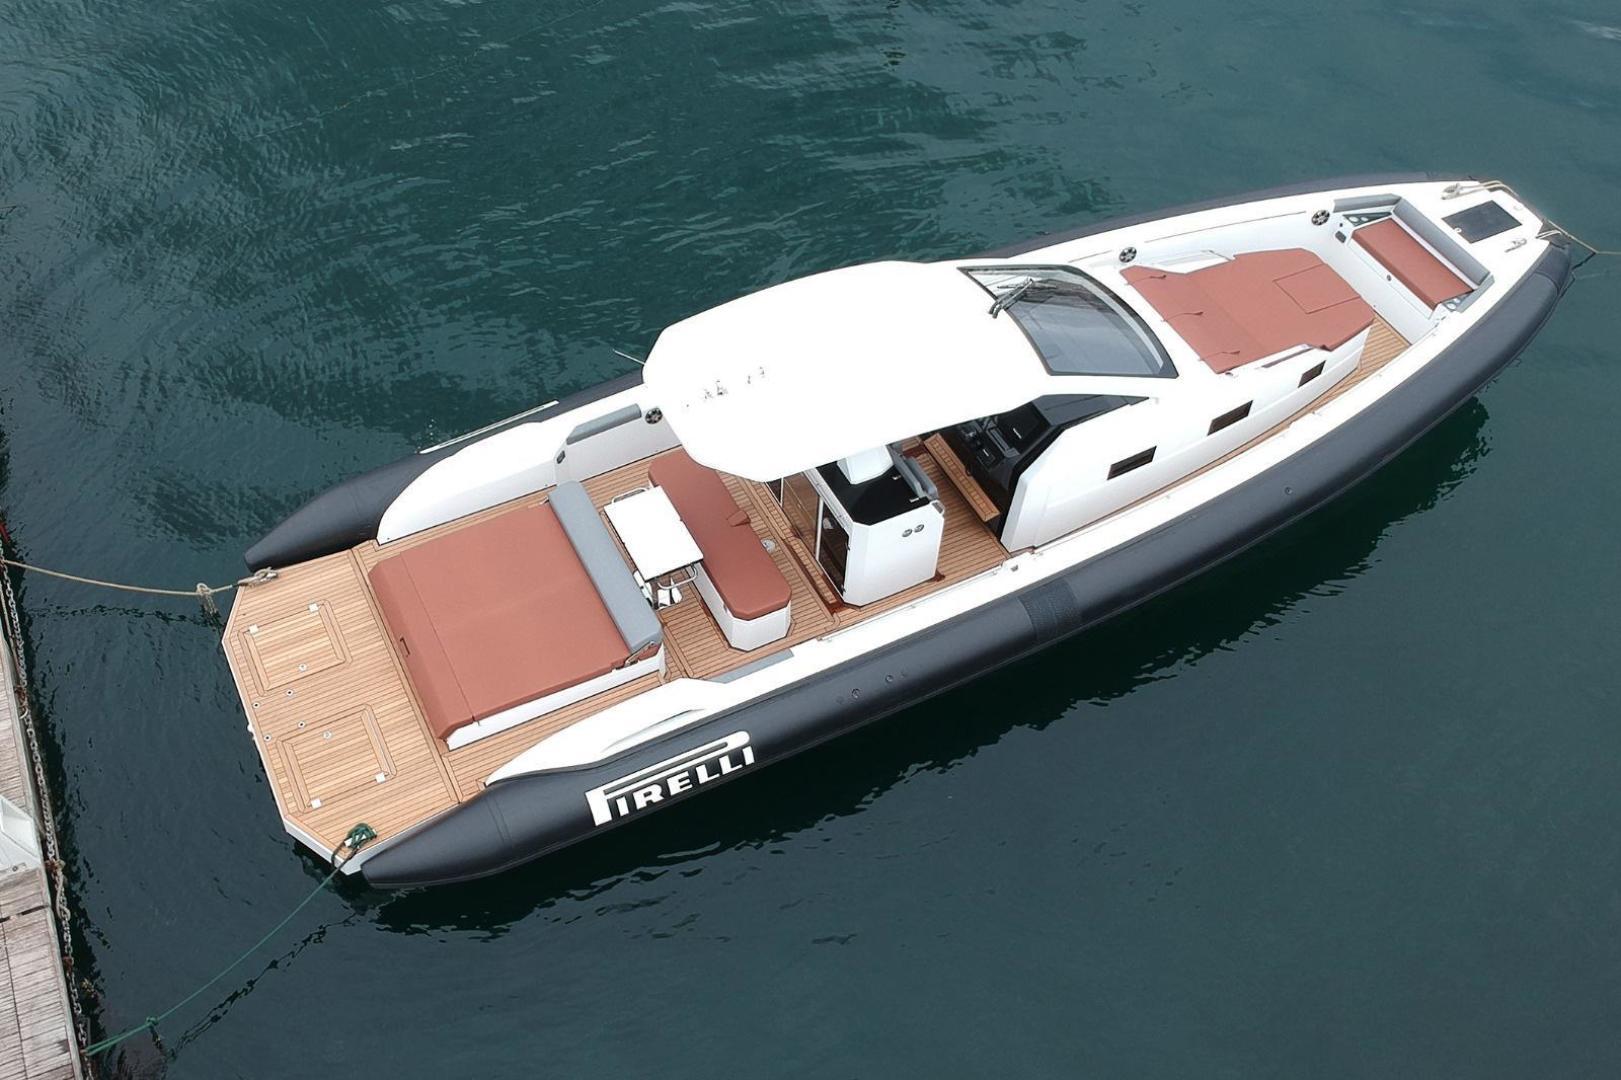 Pirelli-PZero 1250 2020-Pzero 1250 Fort Lauderdale-Florida-United States-1549622   Thumbnail